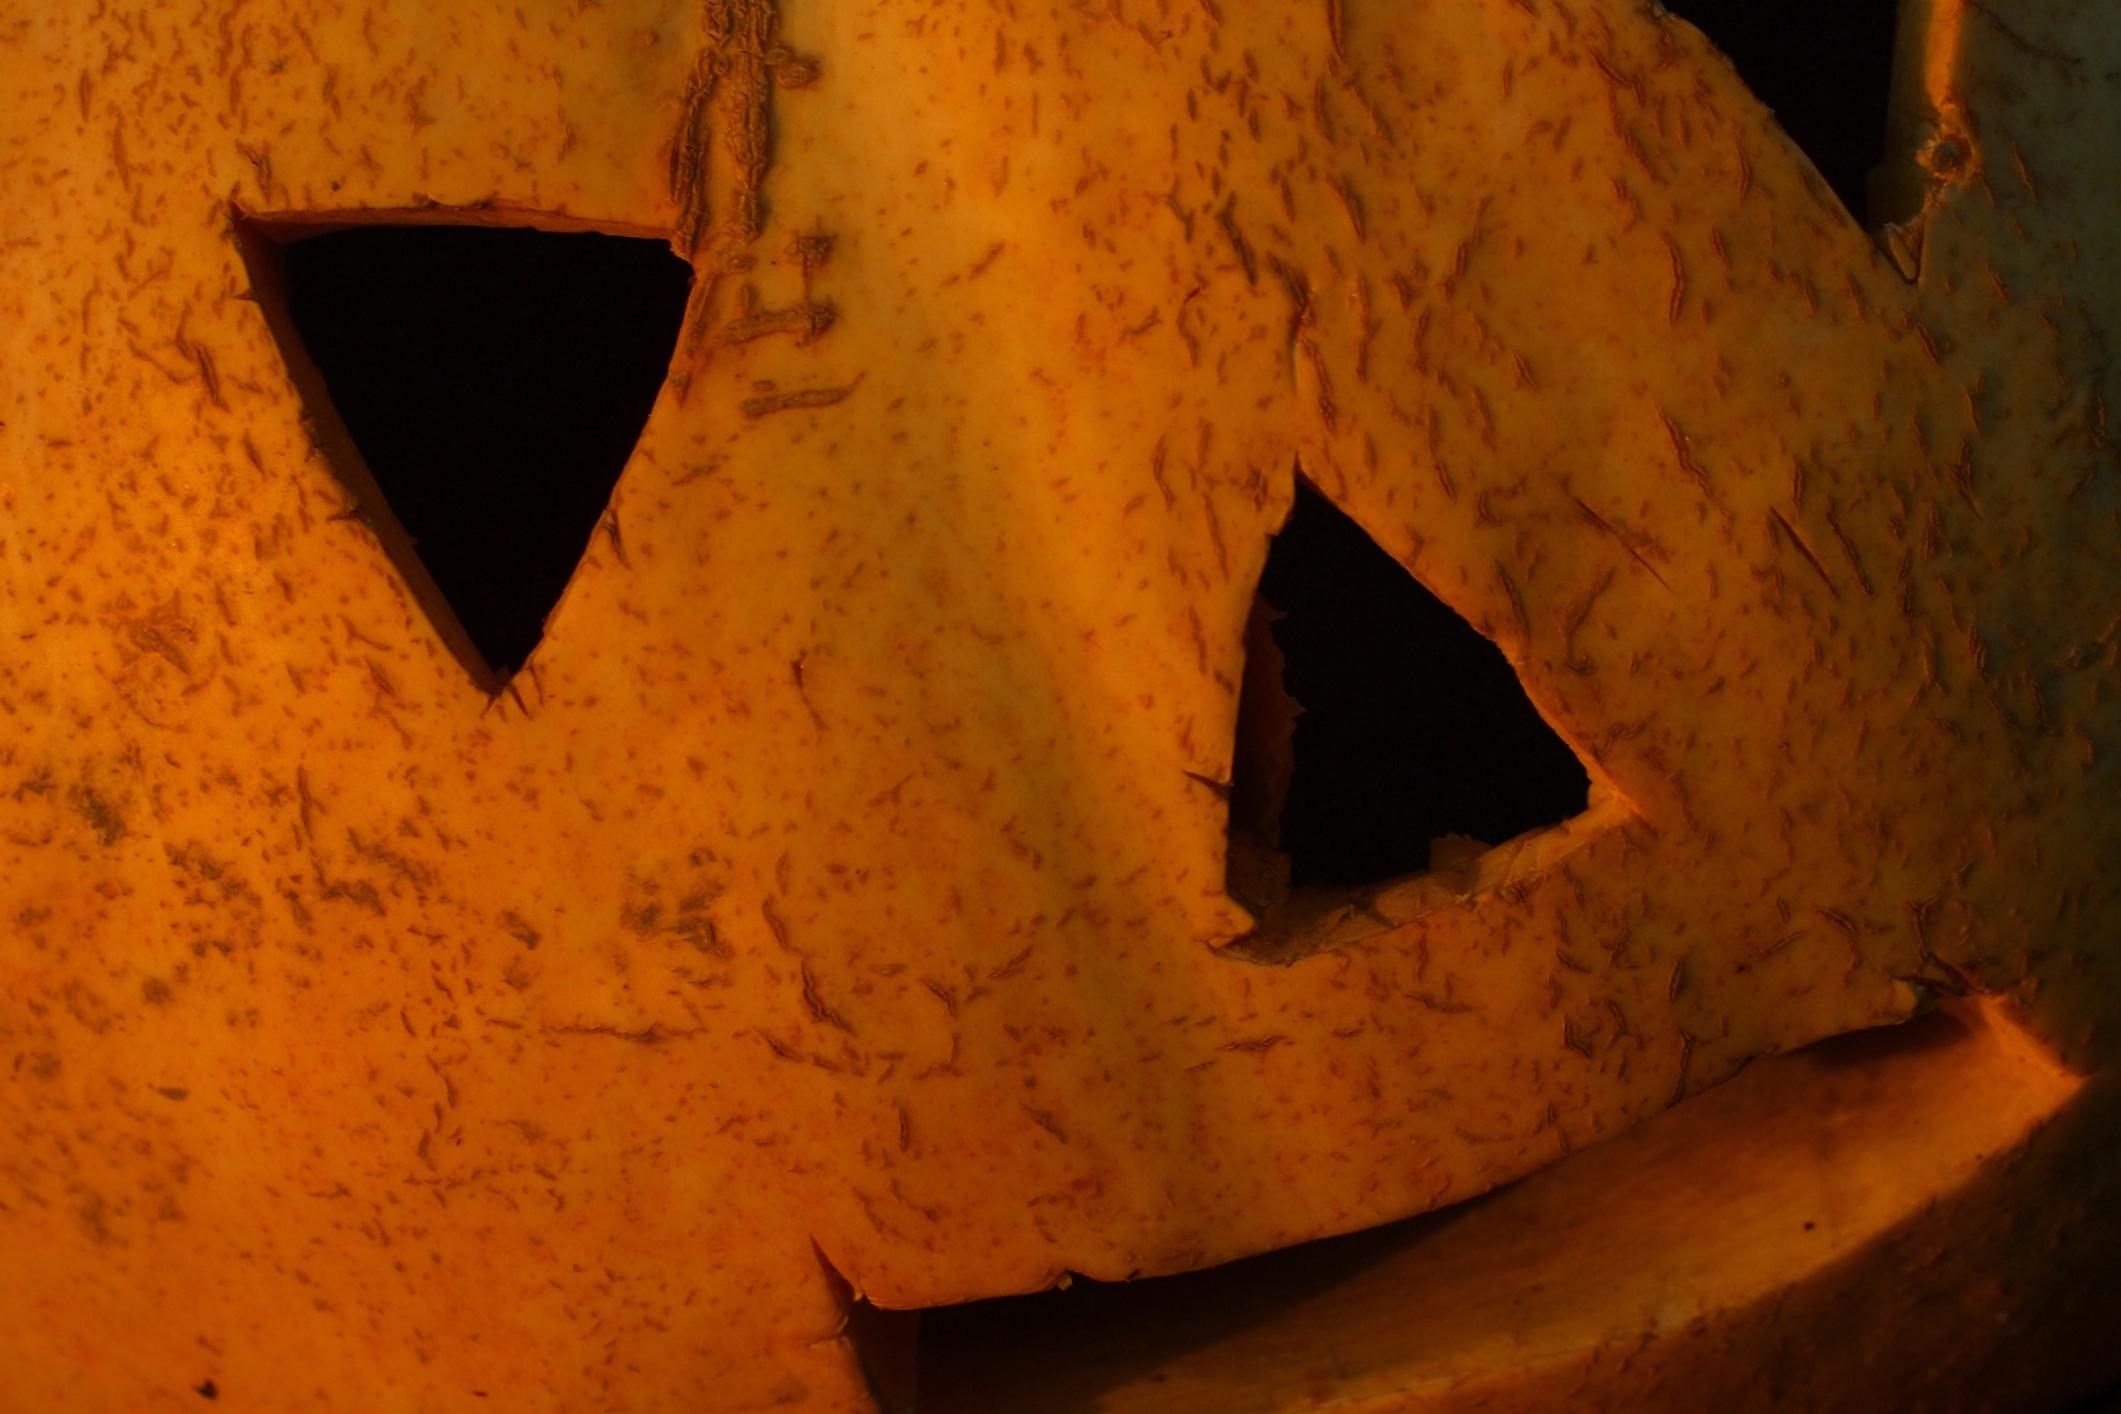 10 Fresh Takes on Halloween Classics